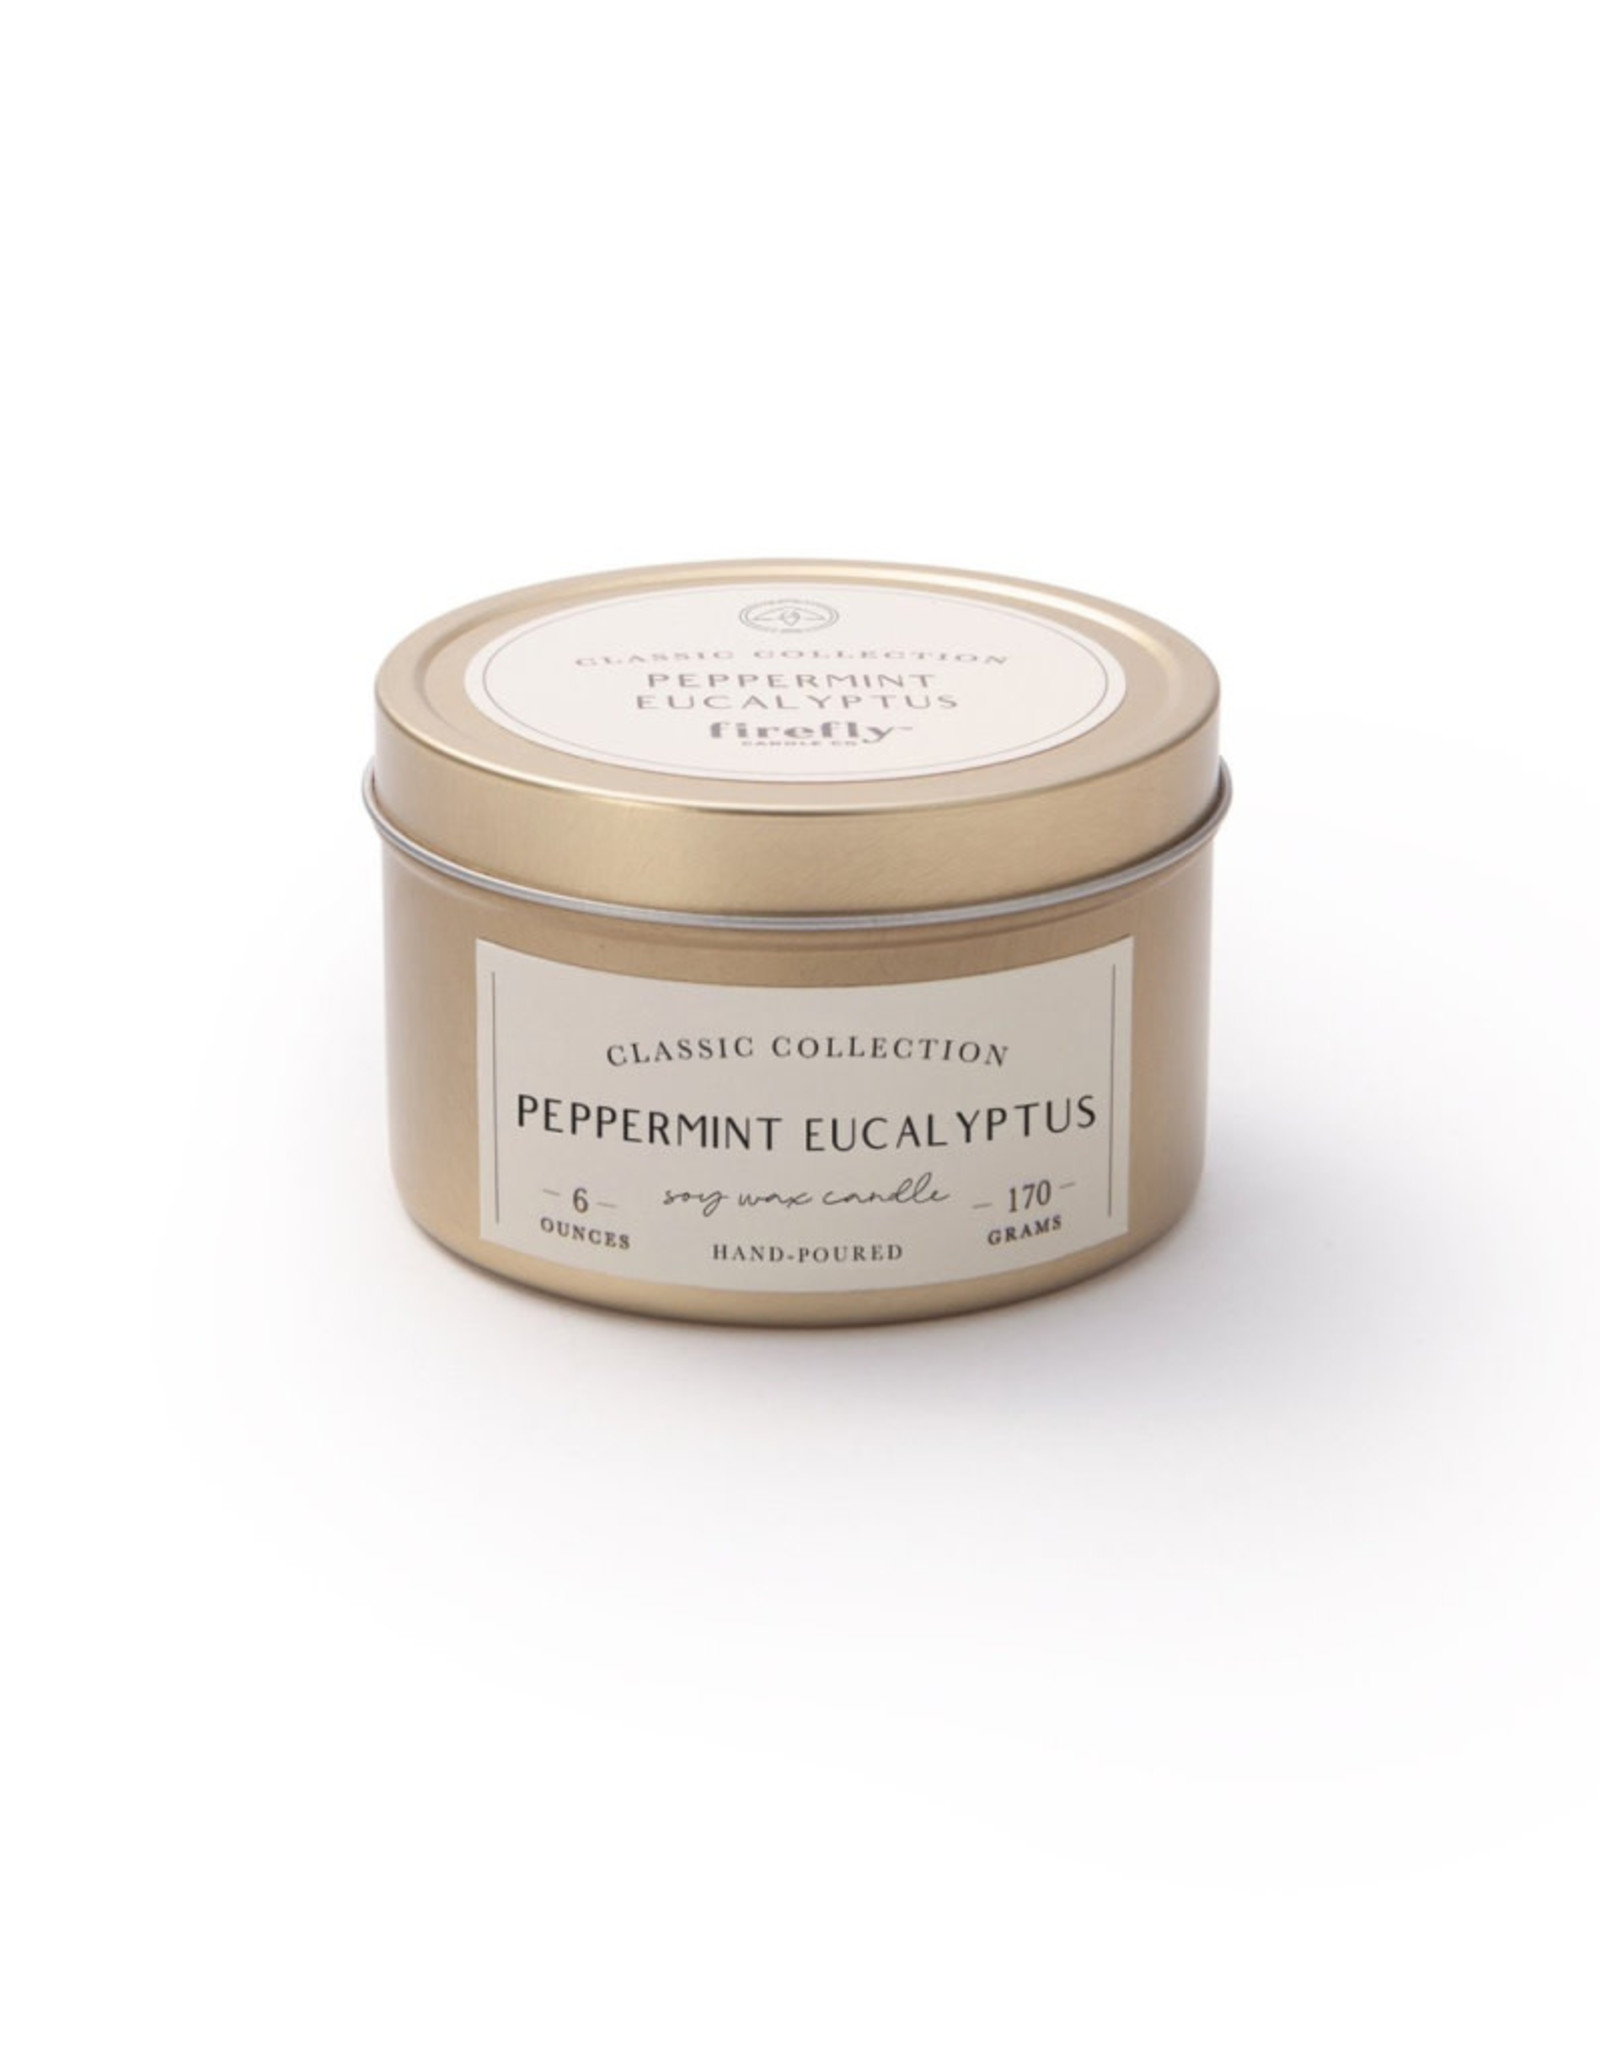 Firefly Classic Candle Tin - Peppermint Eucalyptus 6 oz.